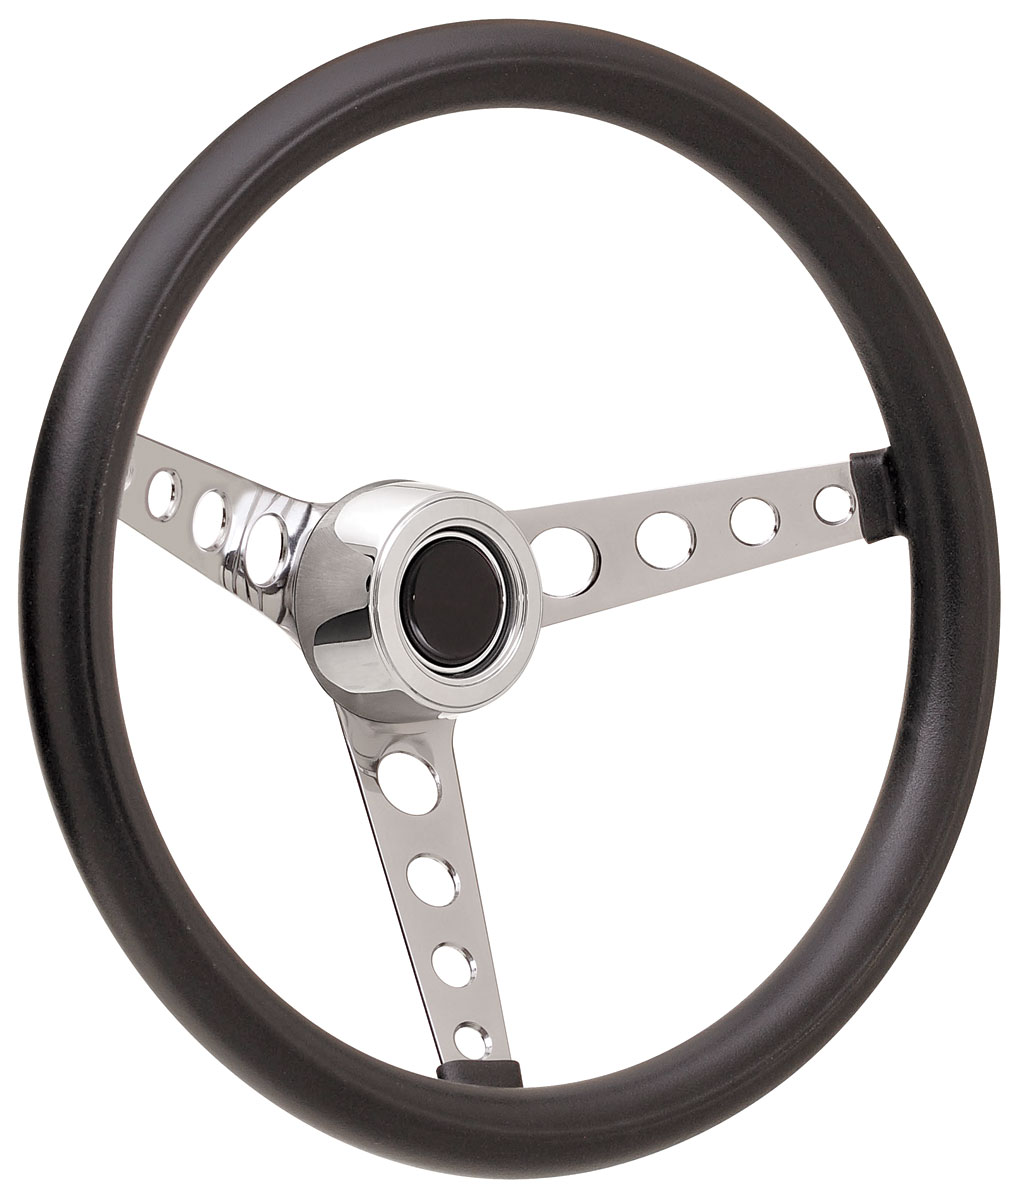 Steering Wheel Kit, 69-77 Pontiac, Classic Foam, Hi Rise Cap, Arrowhead, Black